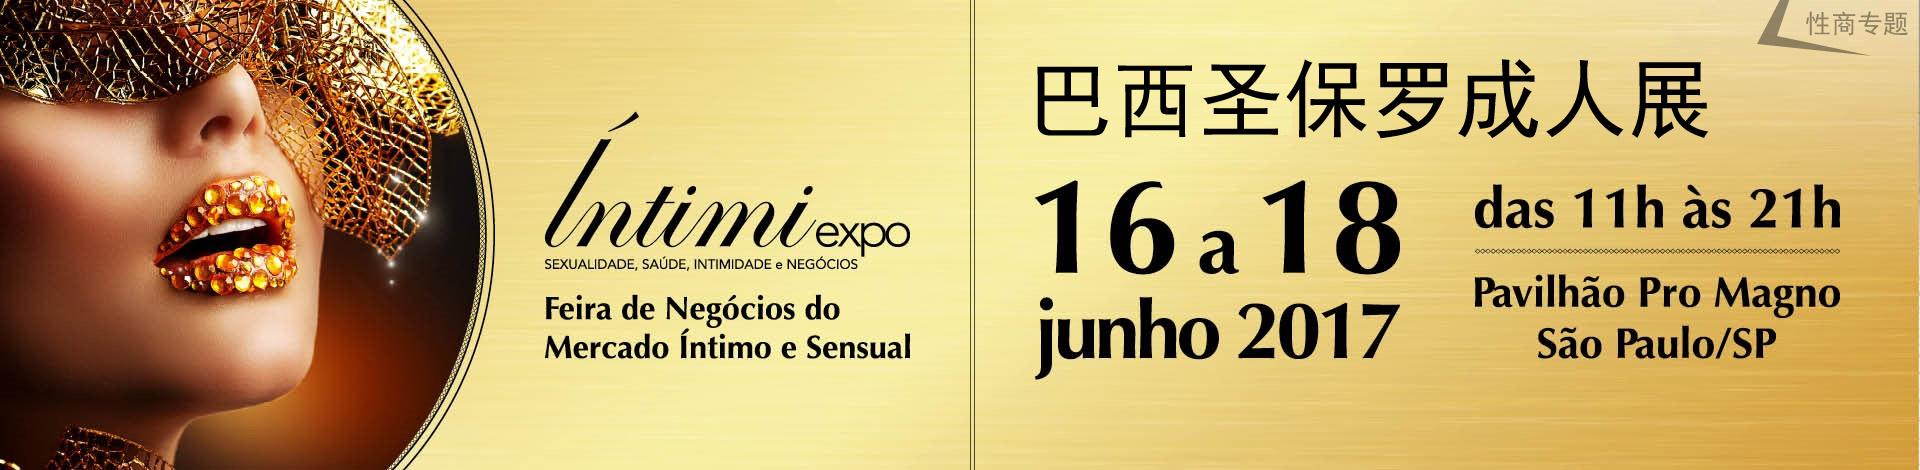 2017巴西成人展IntimiExpo横幅banner